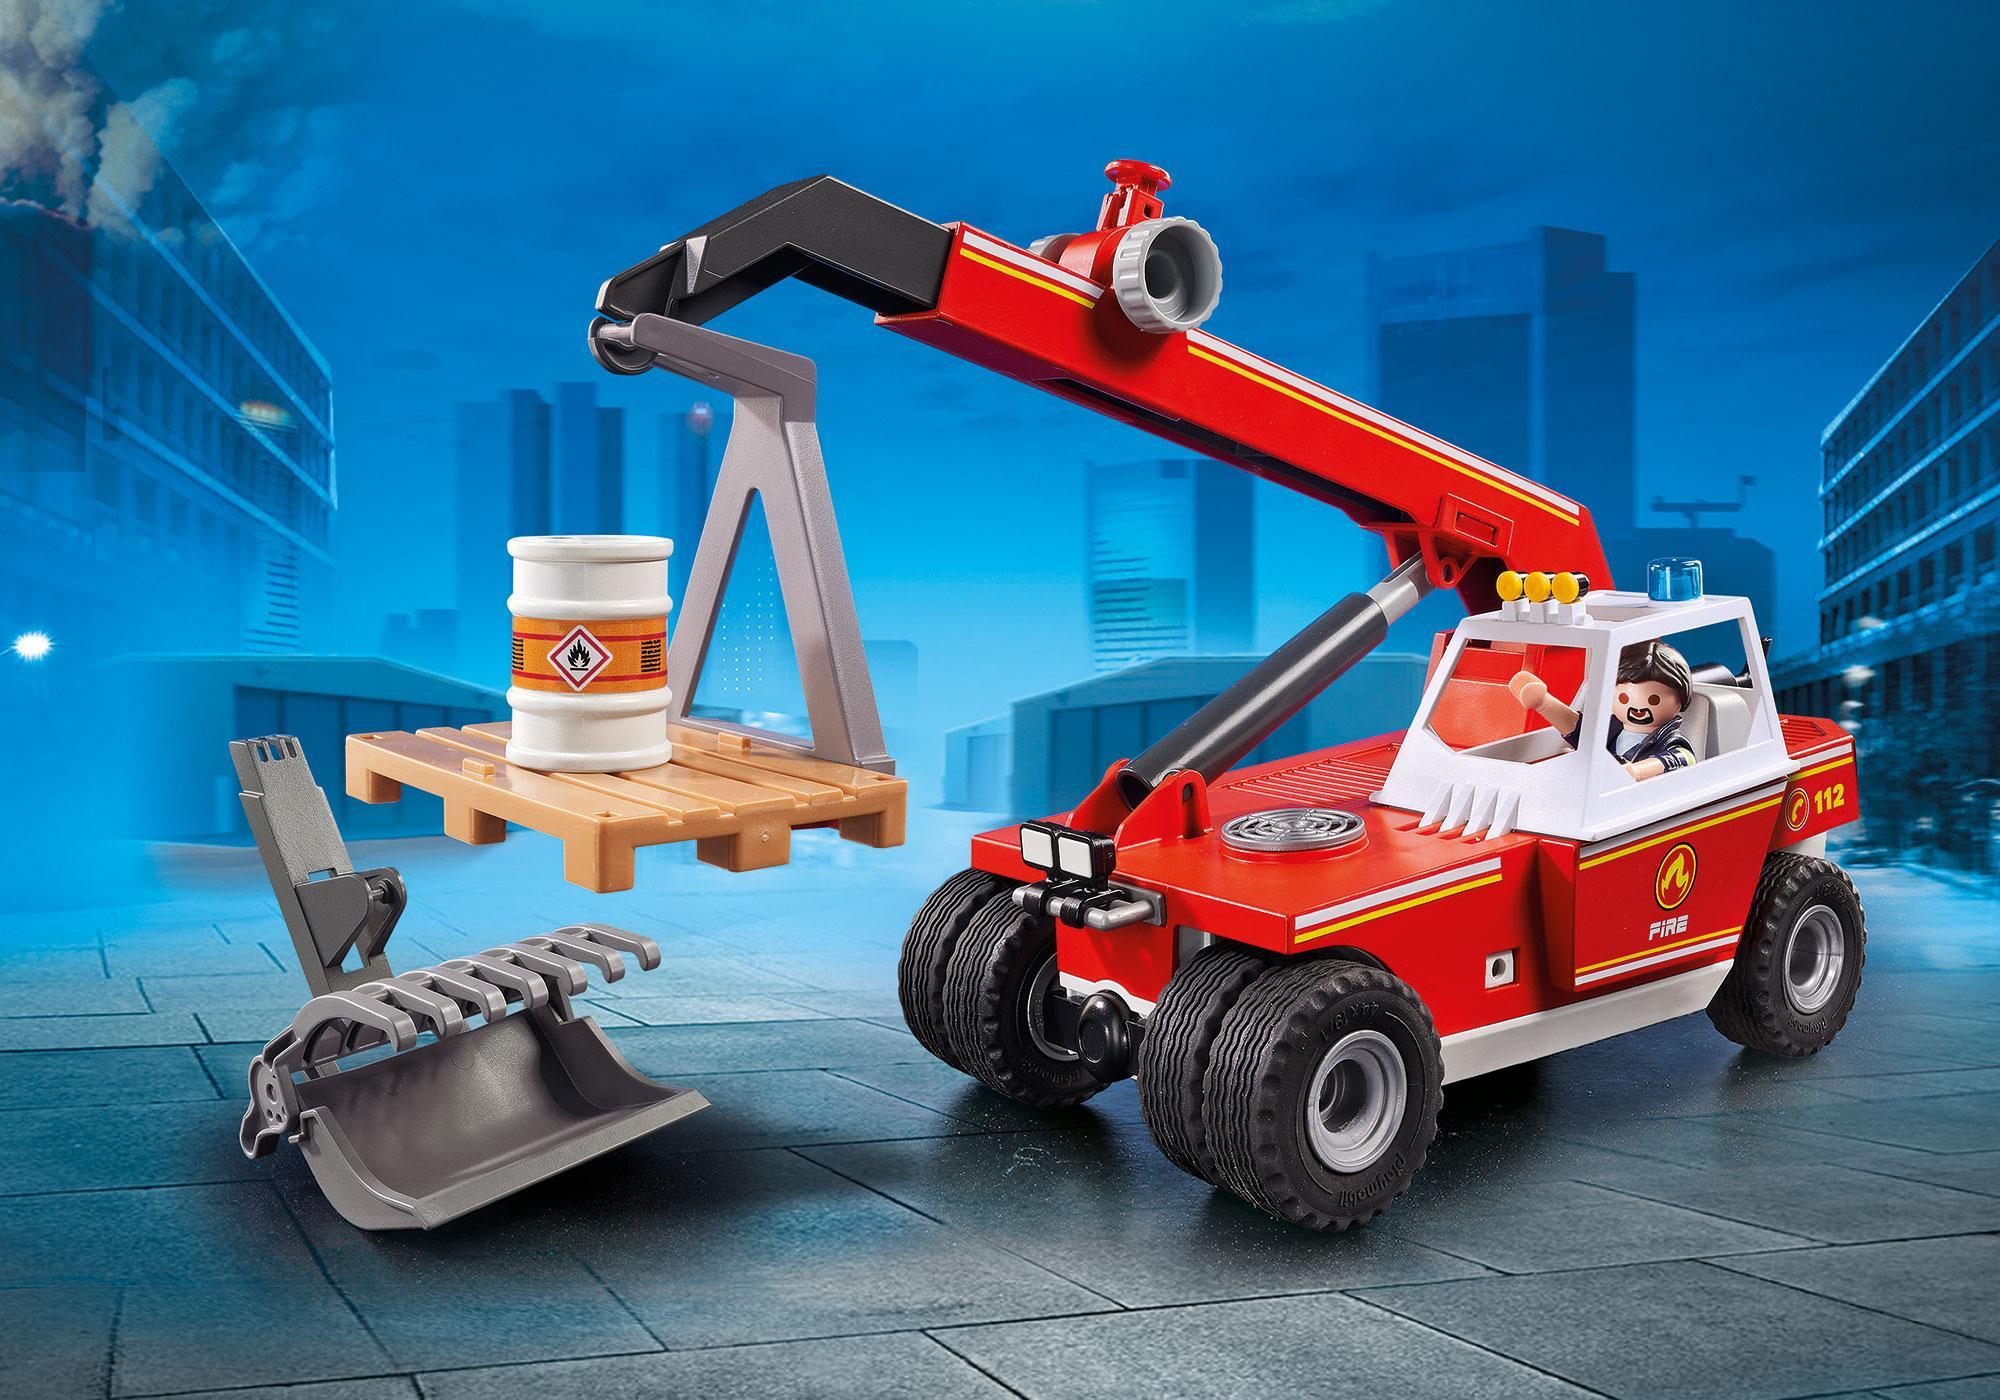 http://media.playmobil.com/i/playmobil/9465_product_detail/Veicolo con braccio telescopico